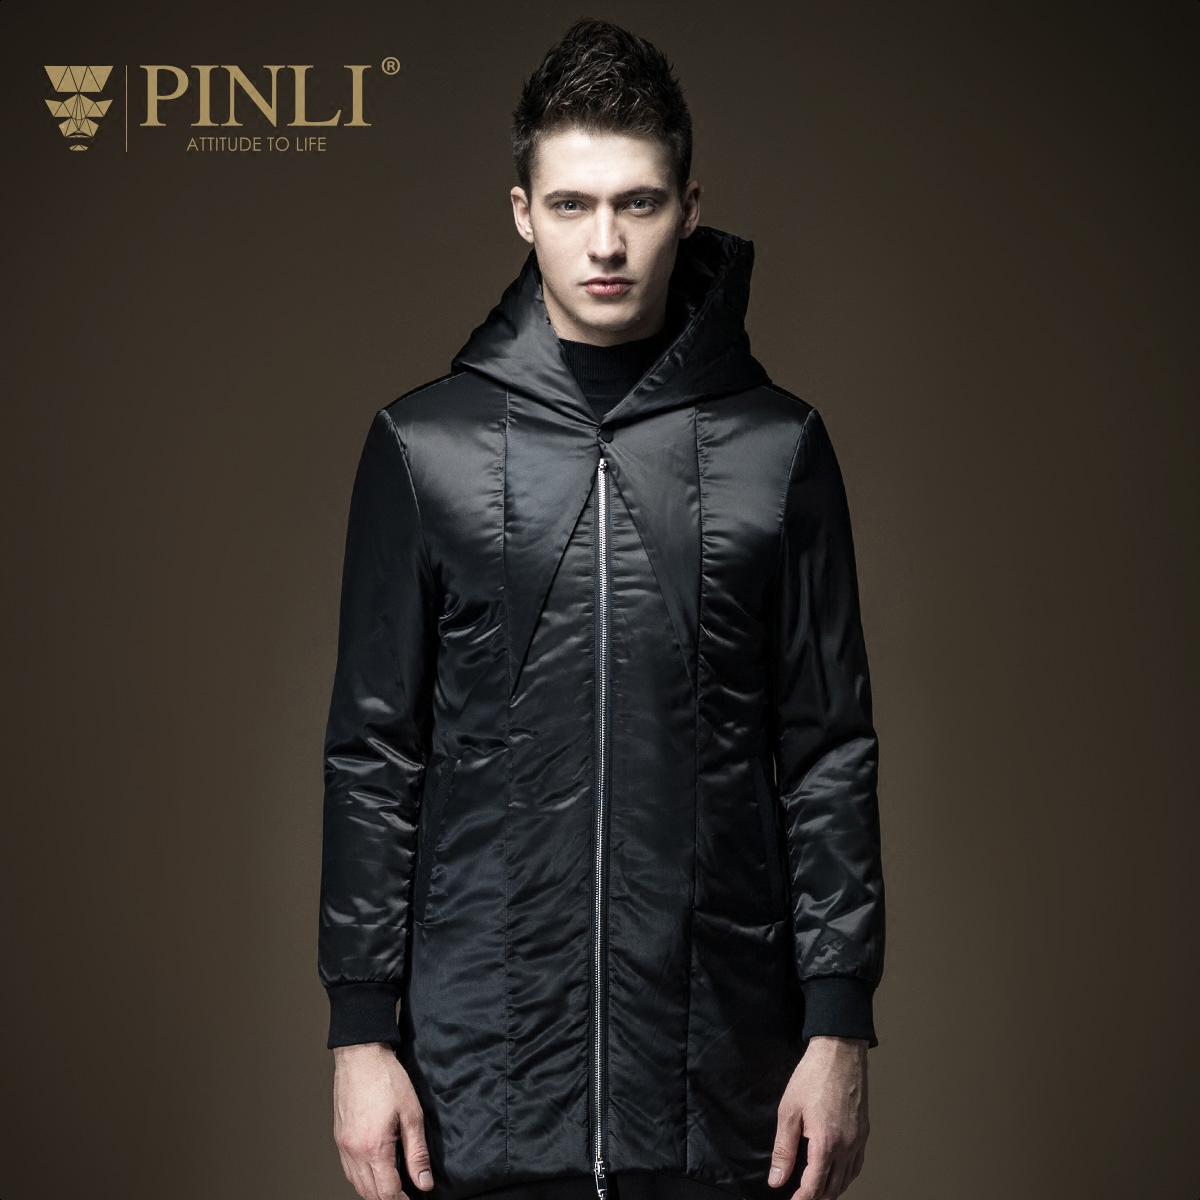 ФОТО Winter Jacket Men Direct Selling Acetate Regular Scarf Collar Cotton Standard Pinli 2016 New Men's Coat Male B164305190